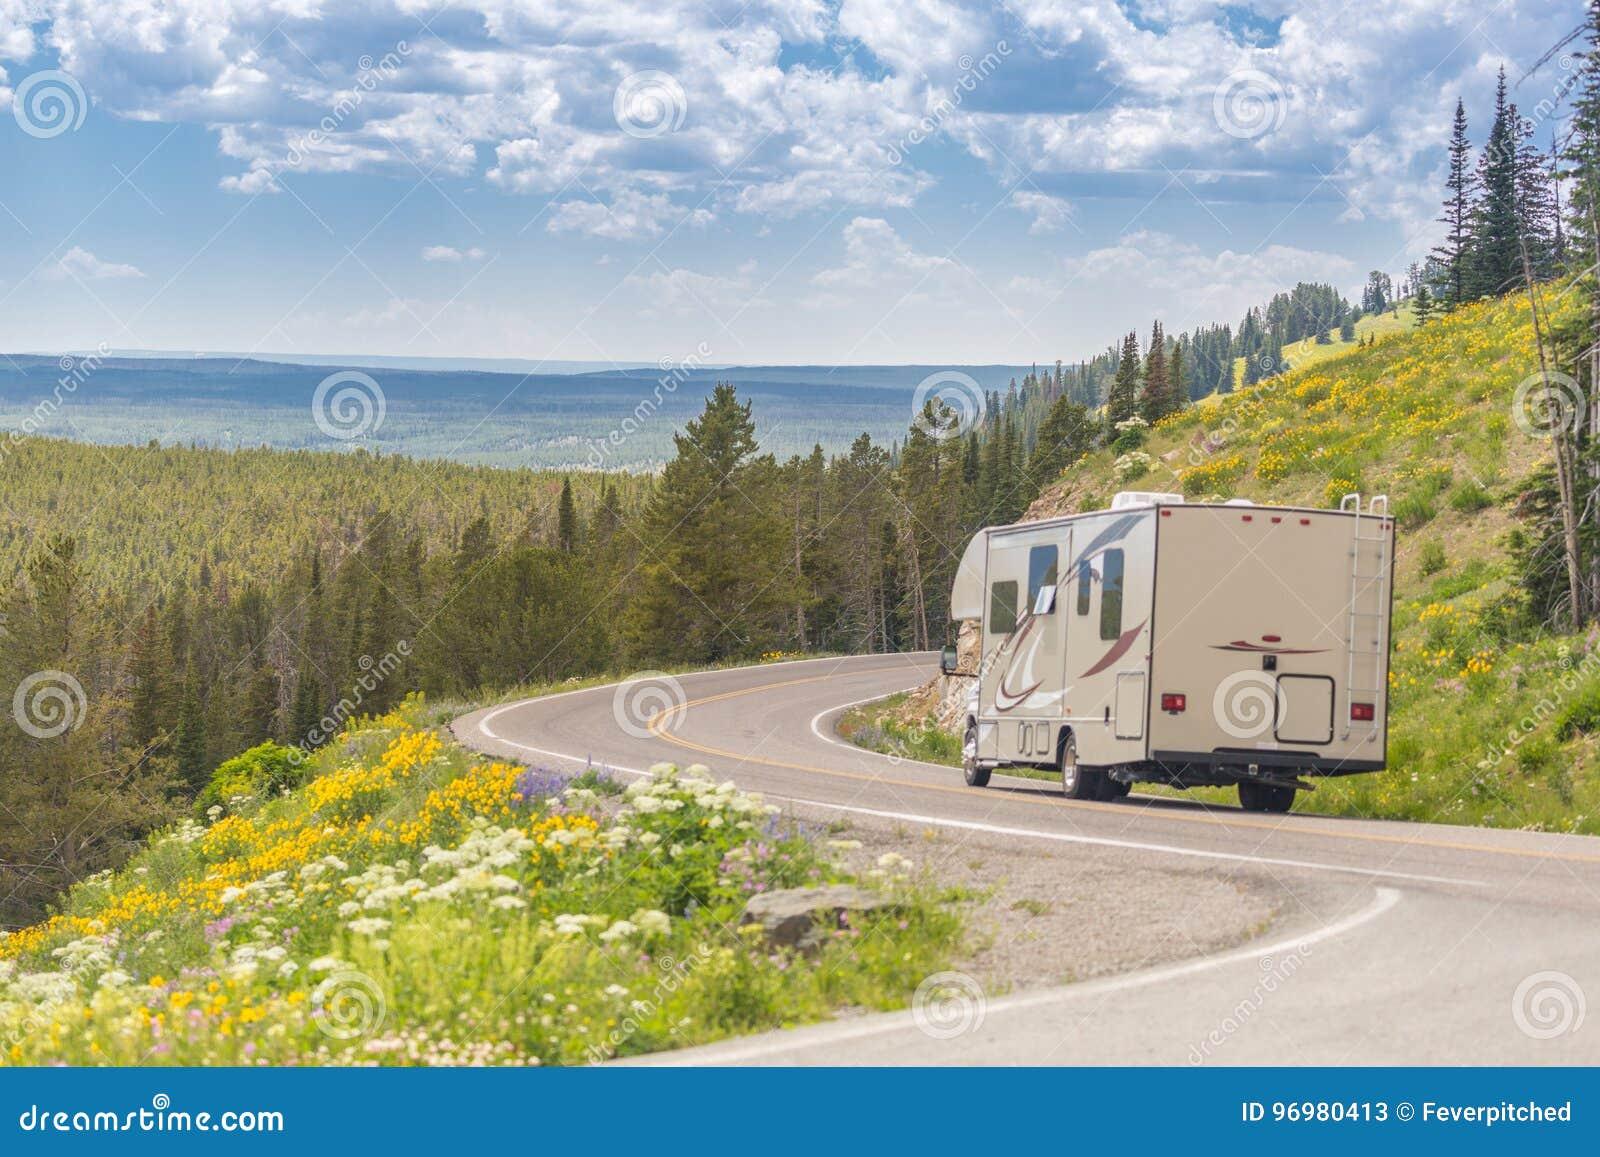 Drive τροχόσπιτων κάτω από το δρόμο στην όμορφη επαρχία μεταξύ του πεύκου